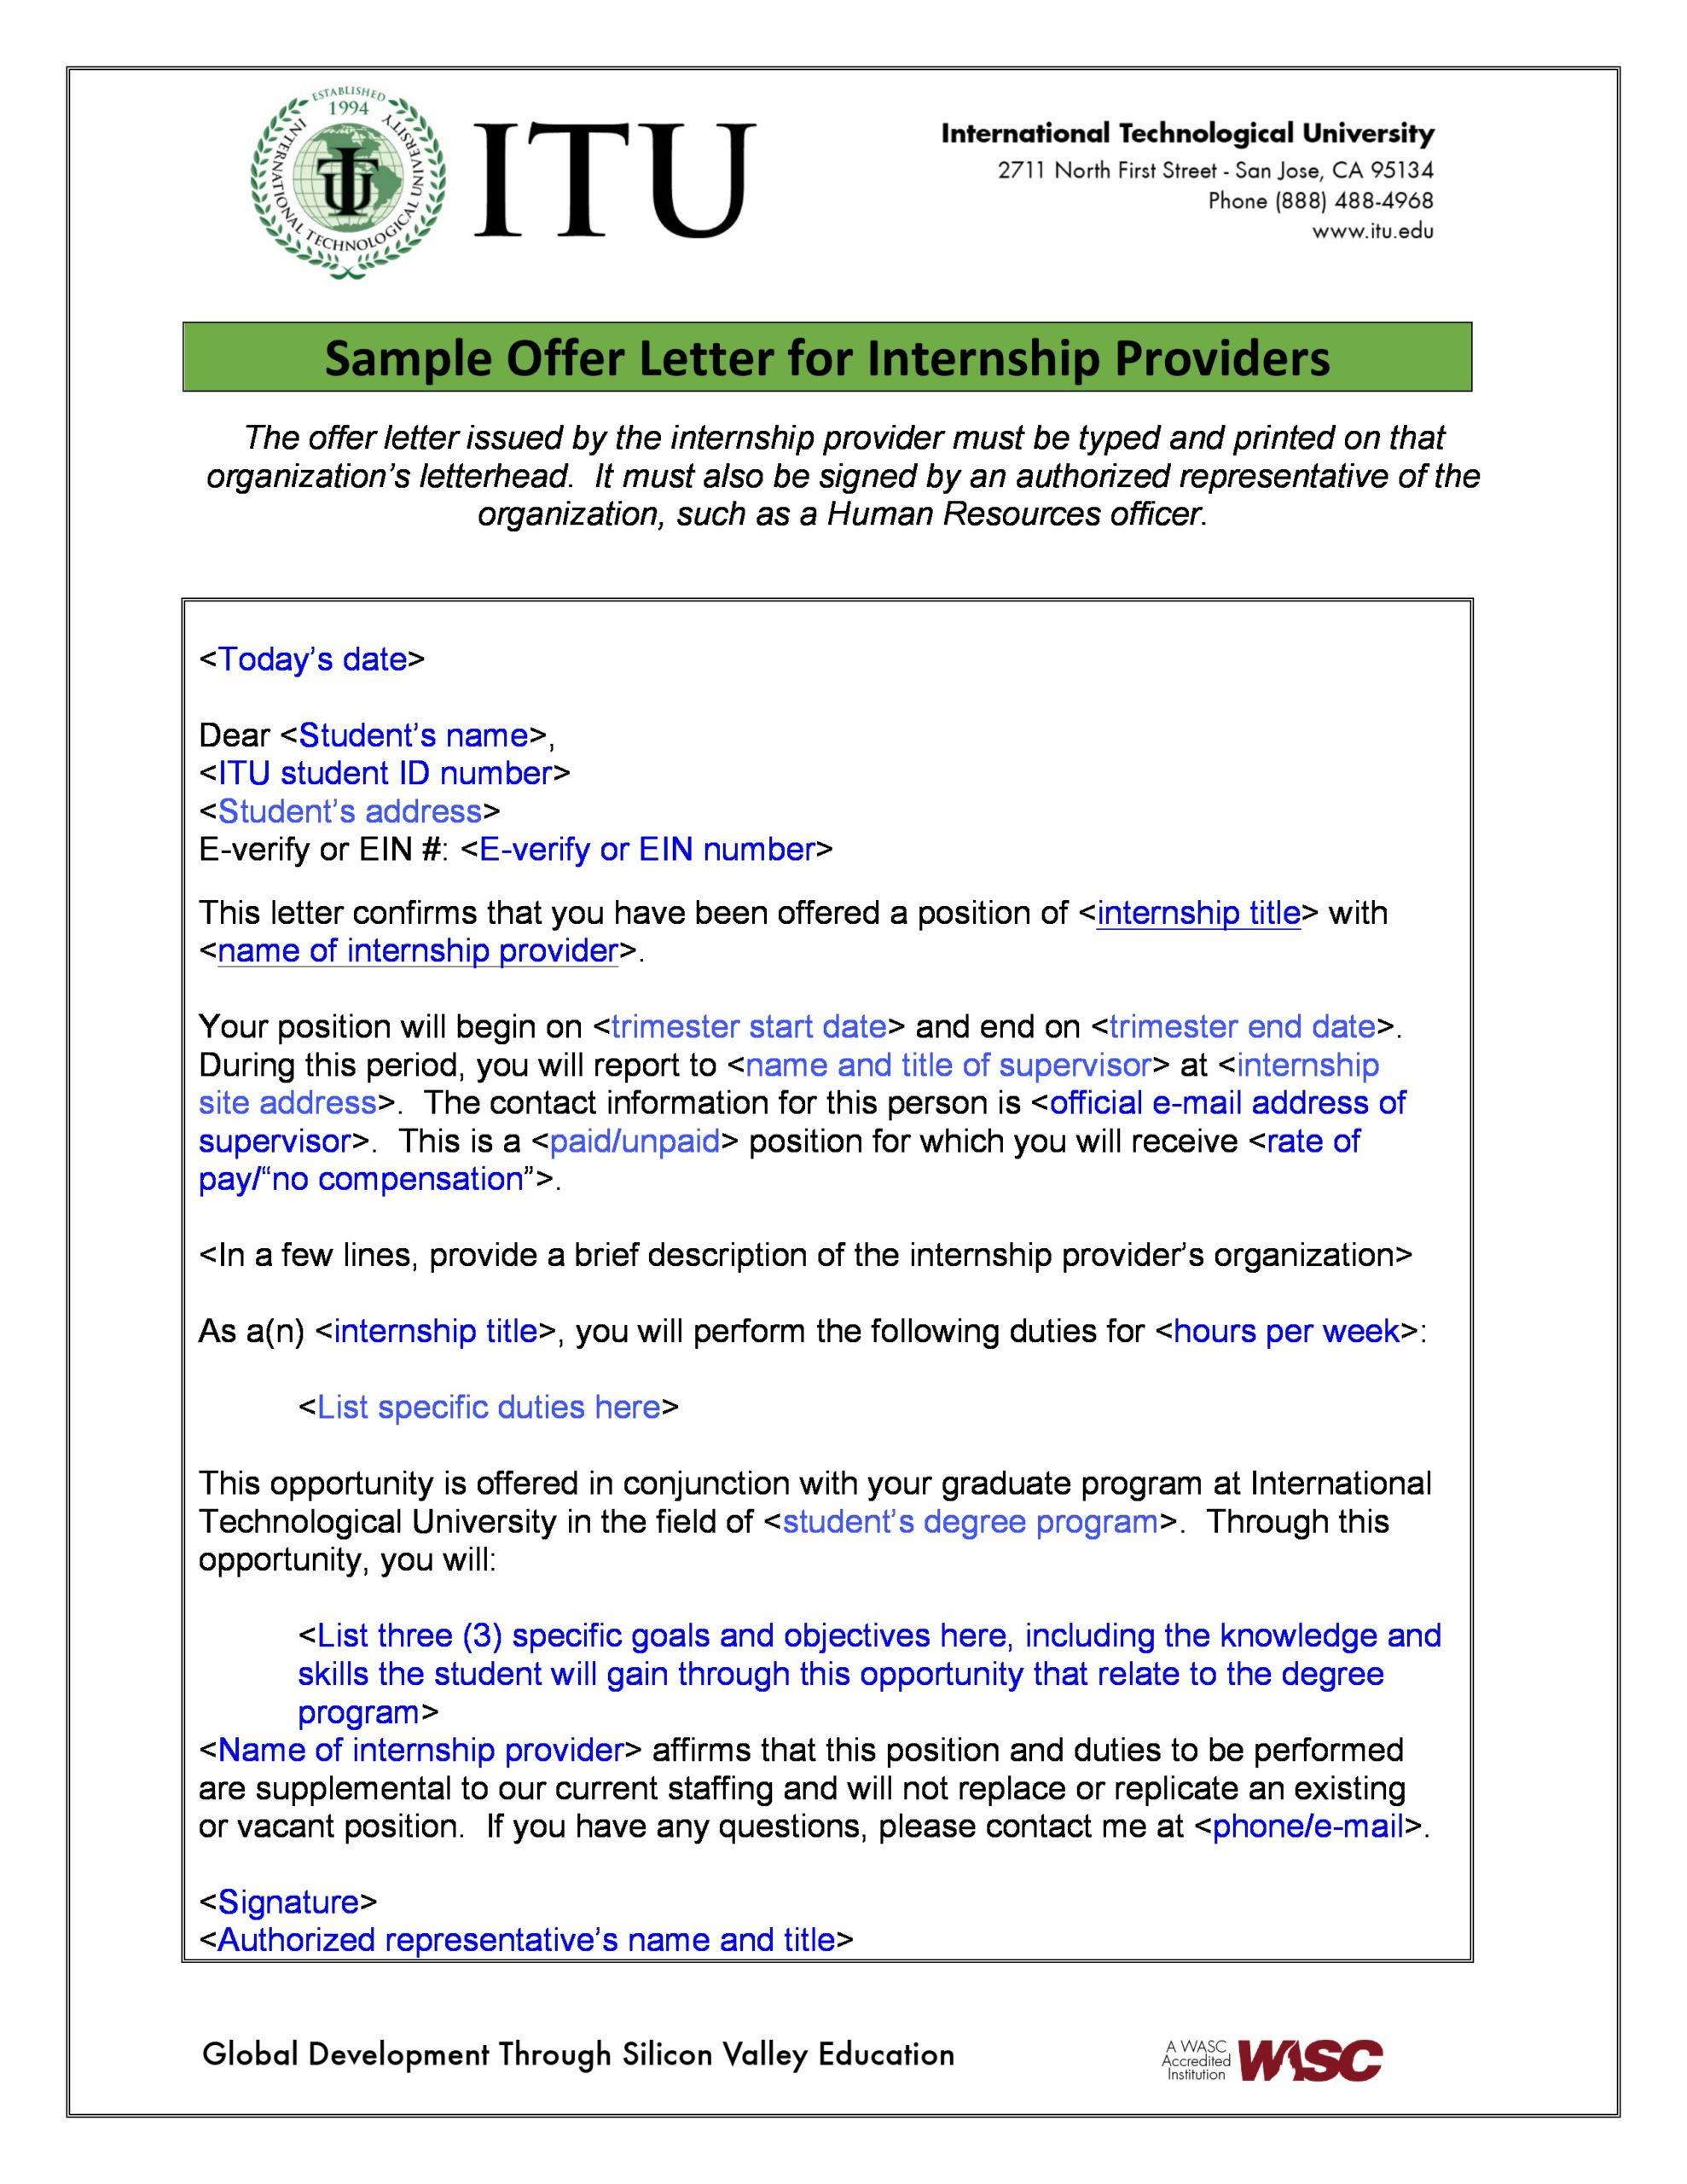 internship offer letter 29